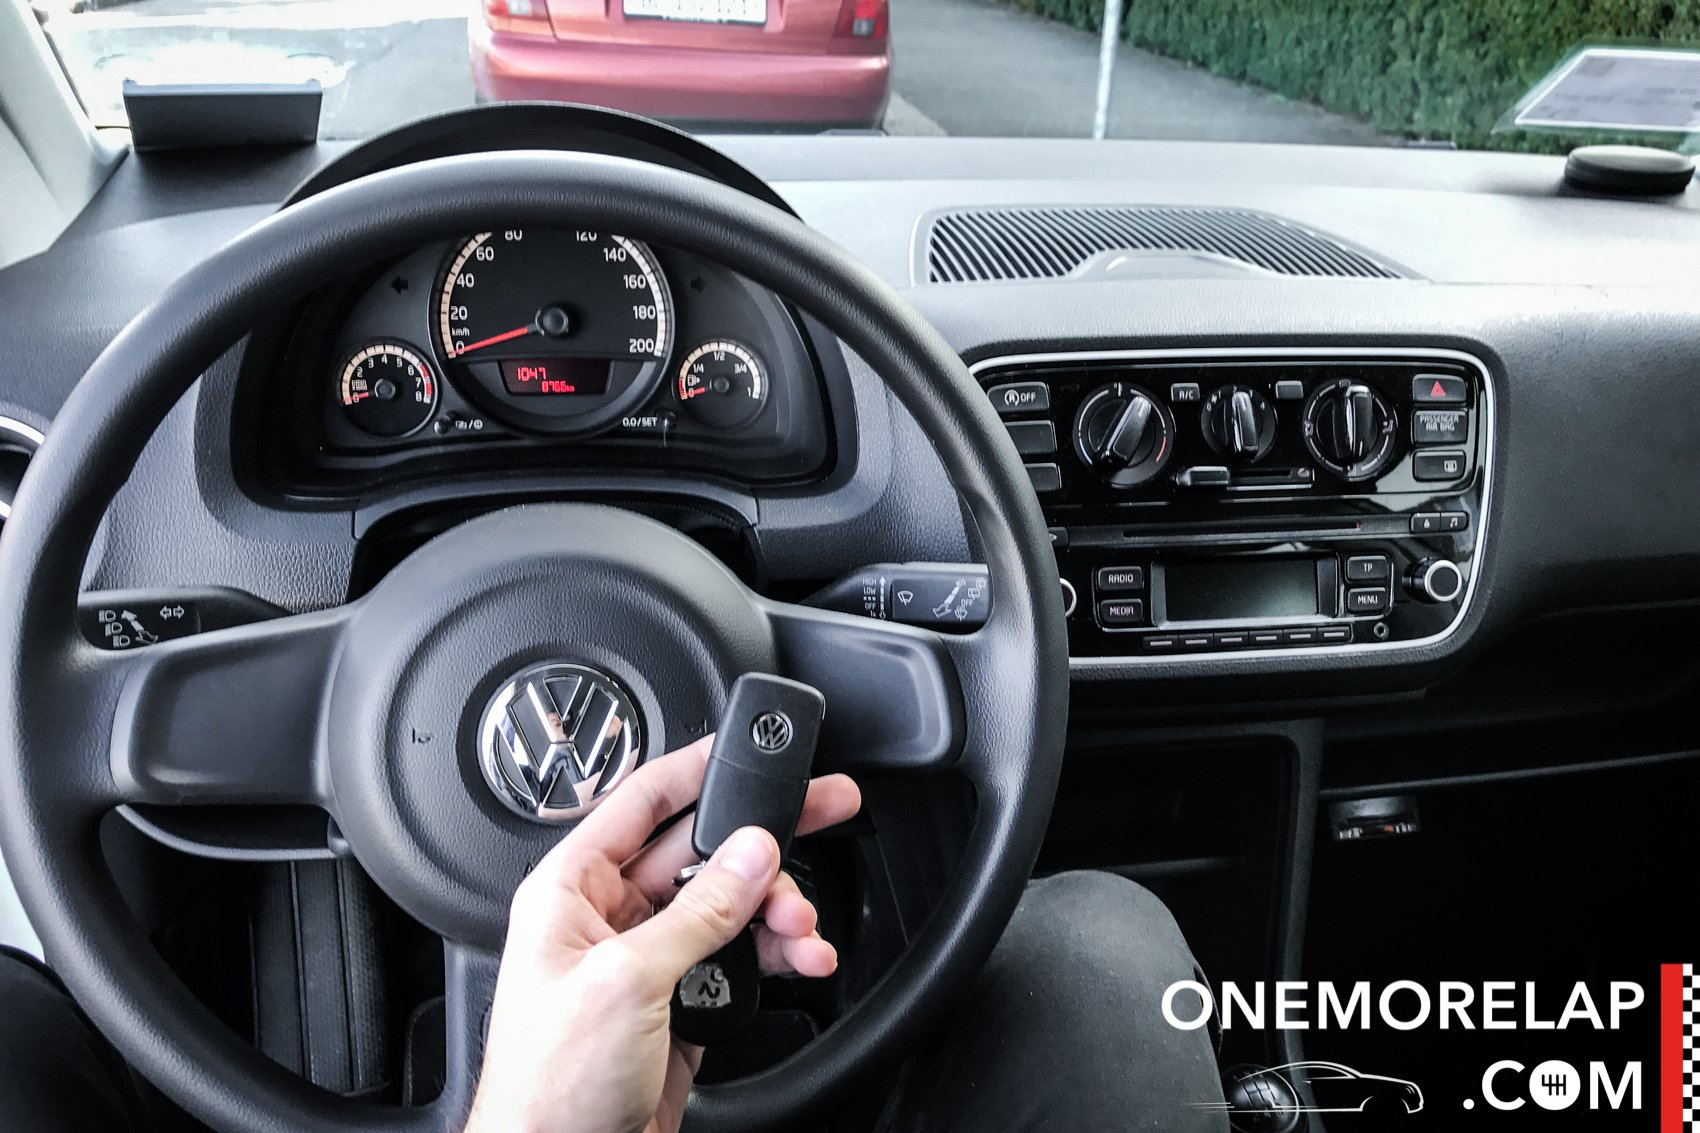 #Sponsored: Catch a Car in Basel - Testbericht